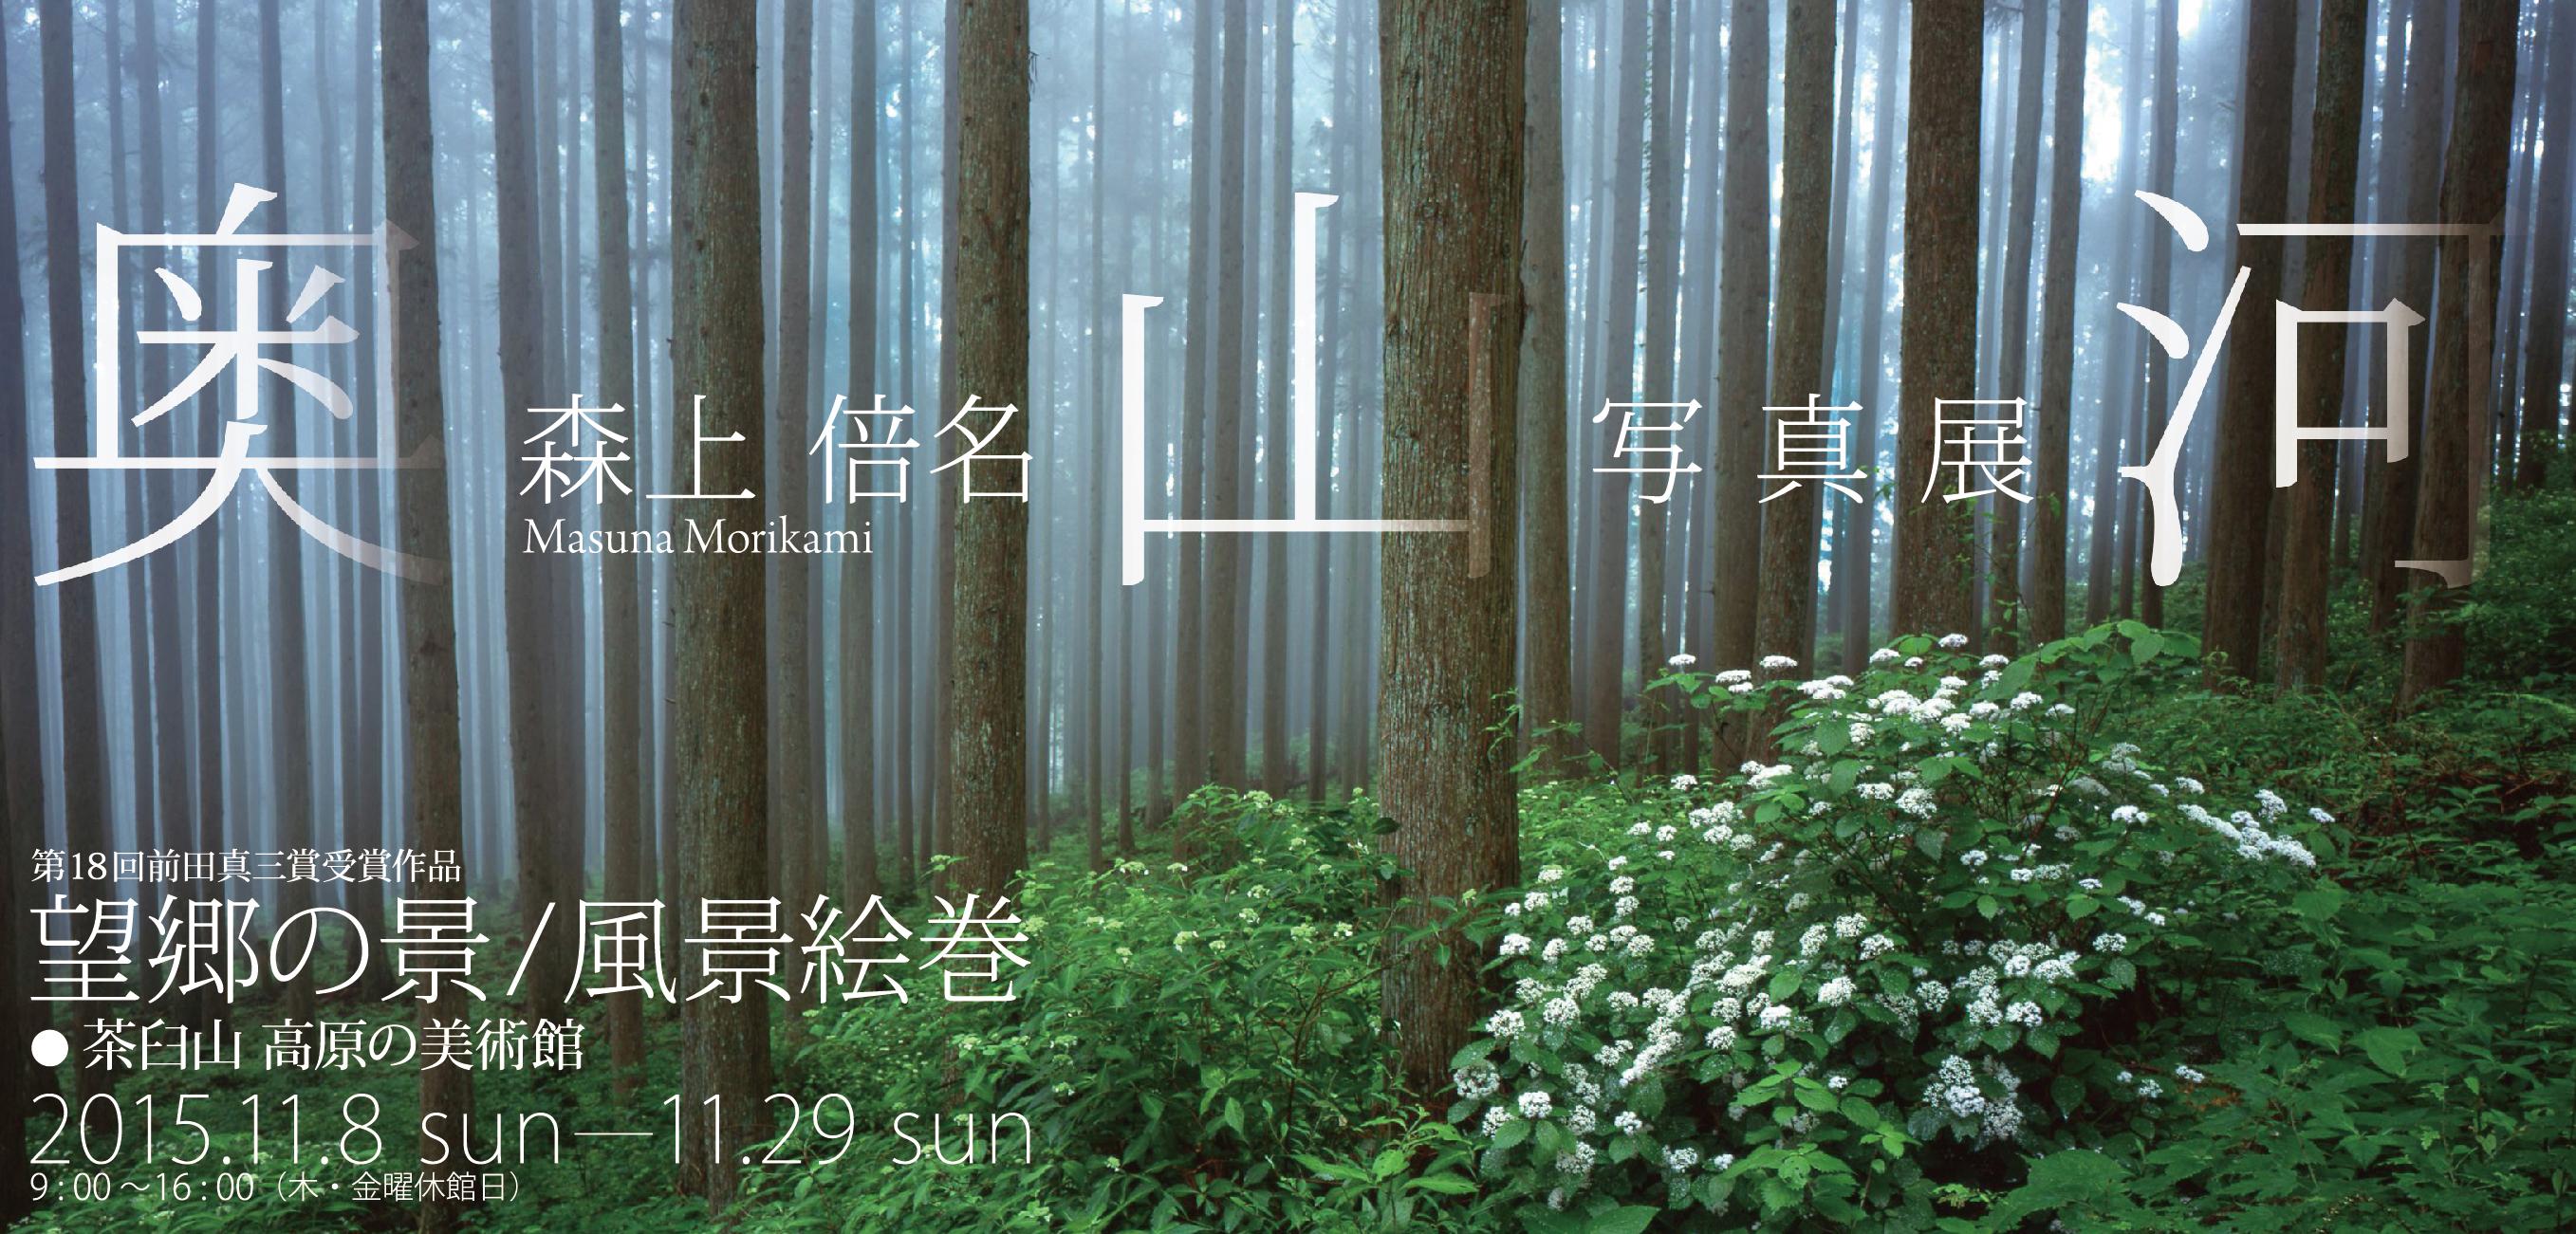 望郷の景/風景絵巻